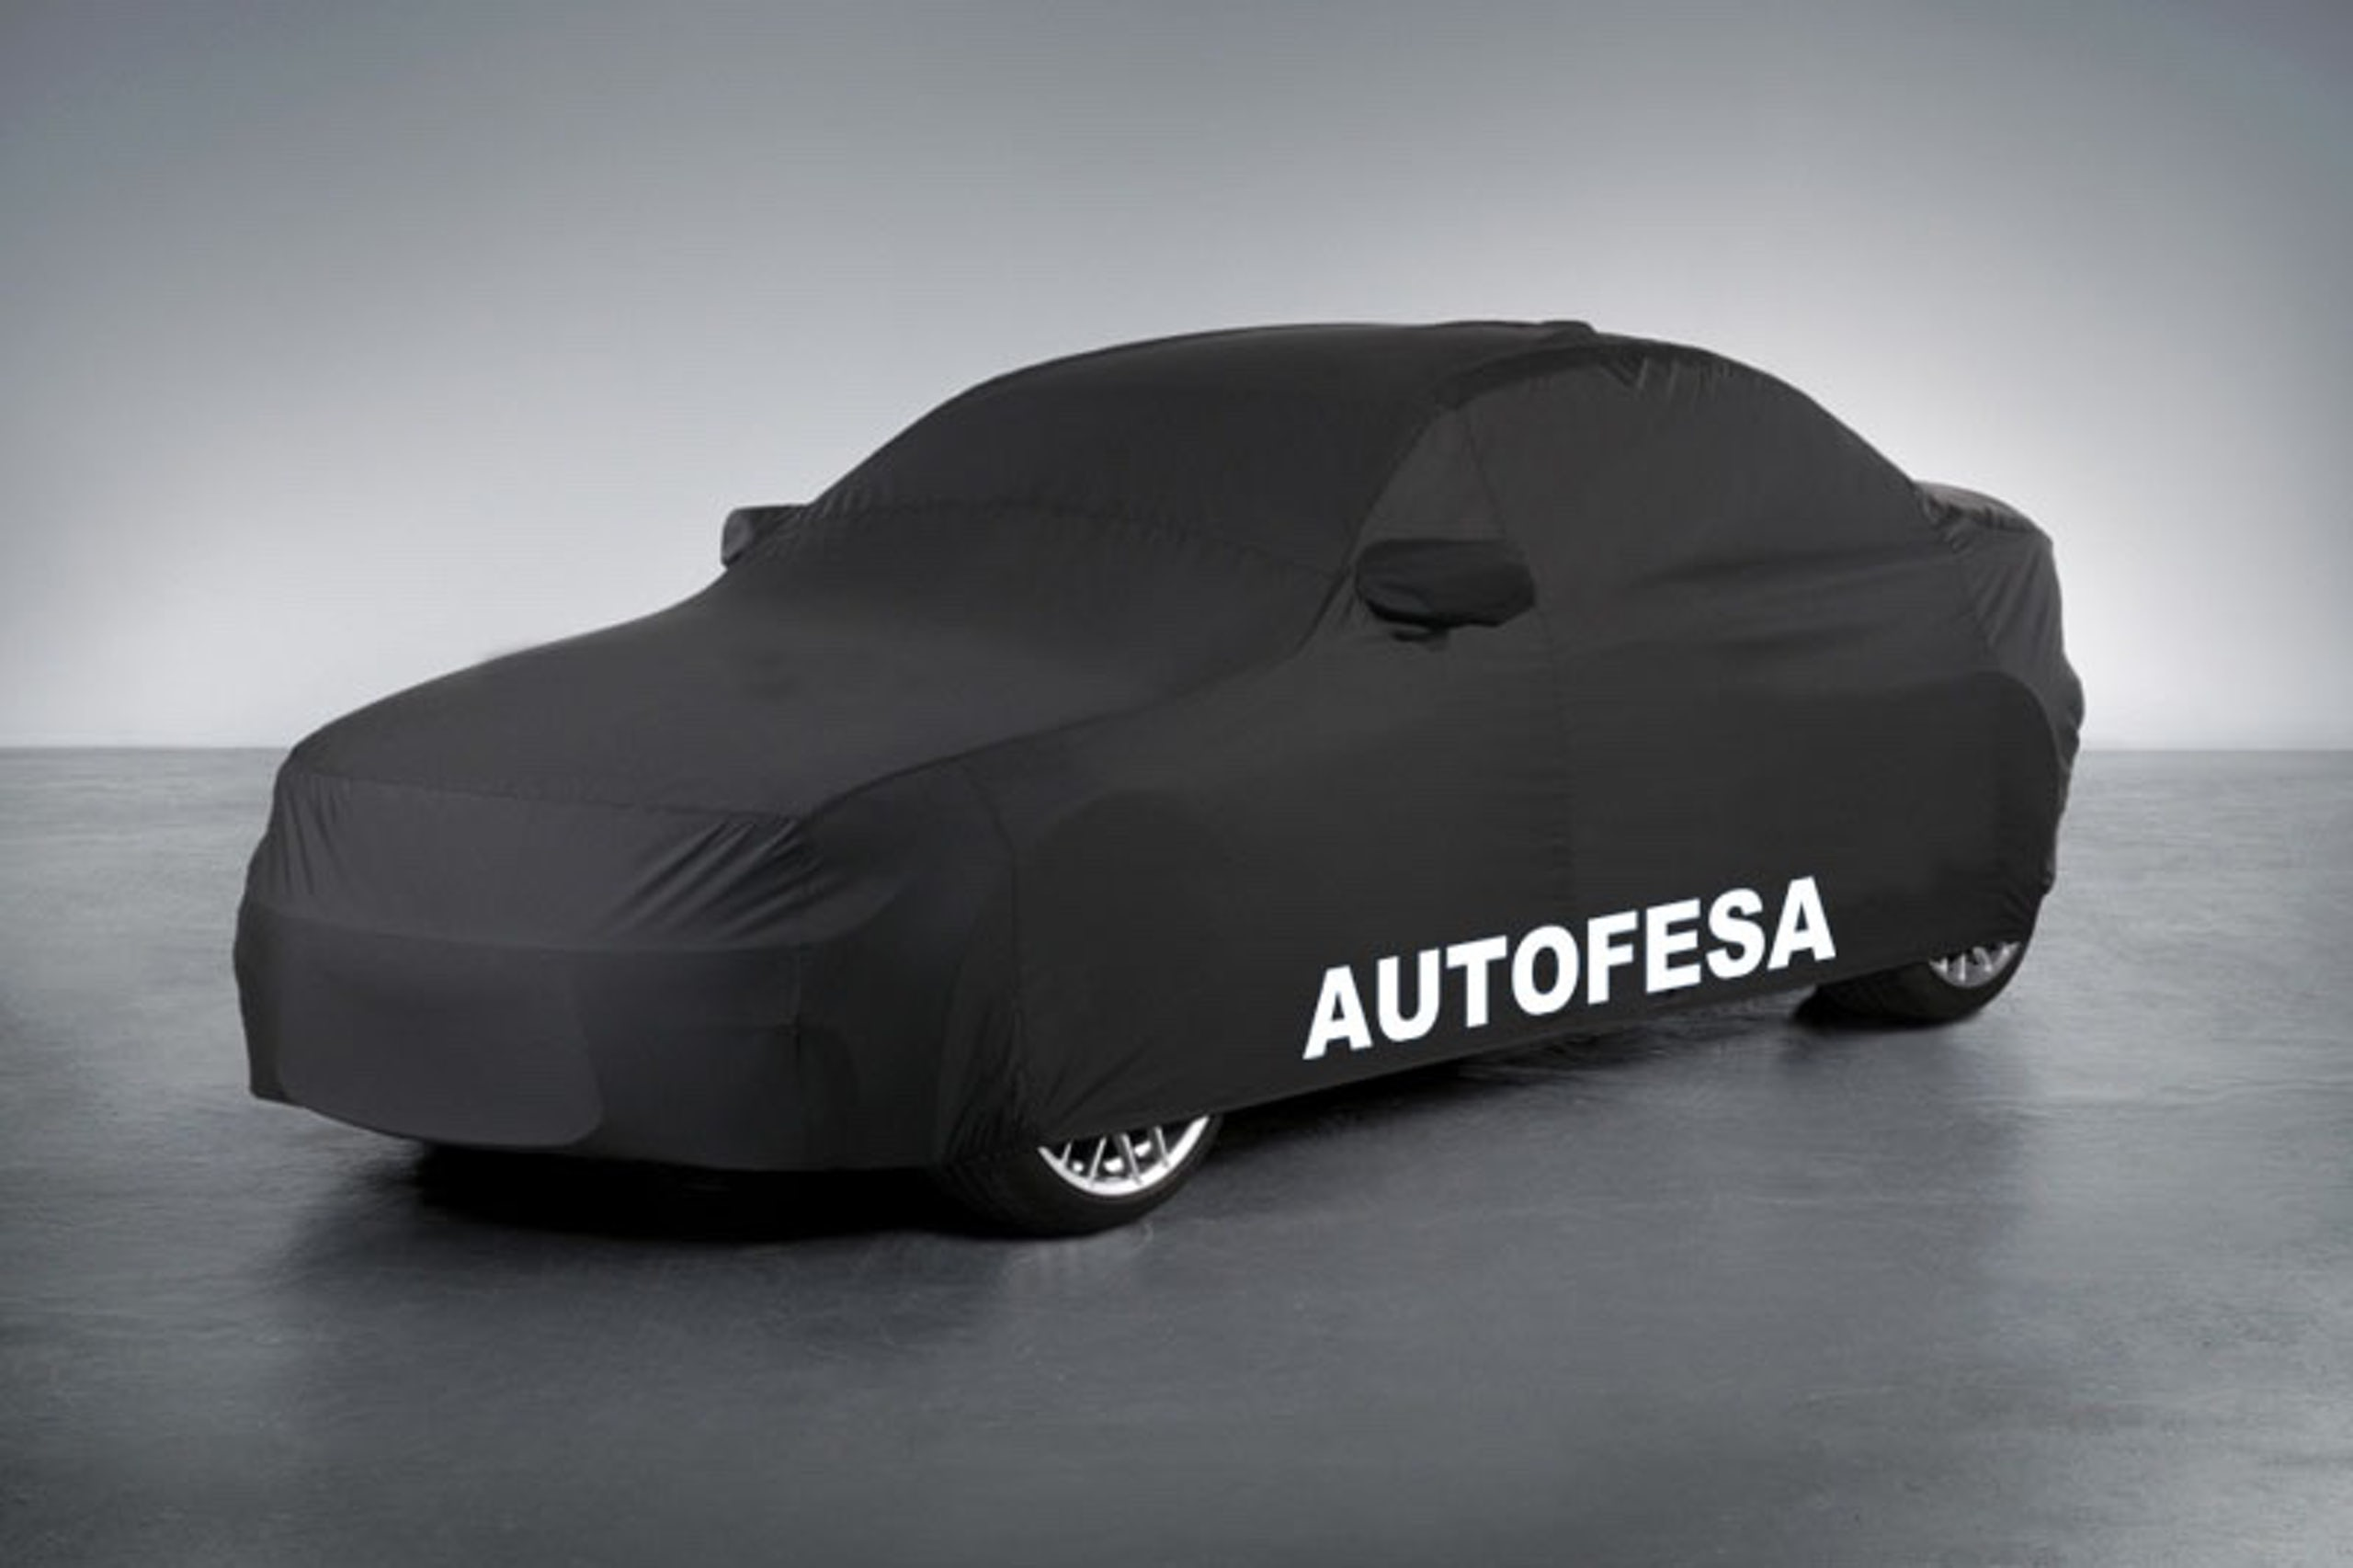 Audi A6 A6 3.0 TDI AVANT 204cv quattro 5p S tronic Auto S/S - Foto 11